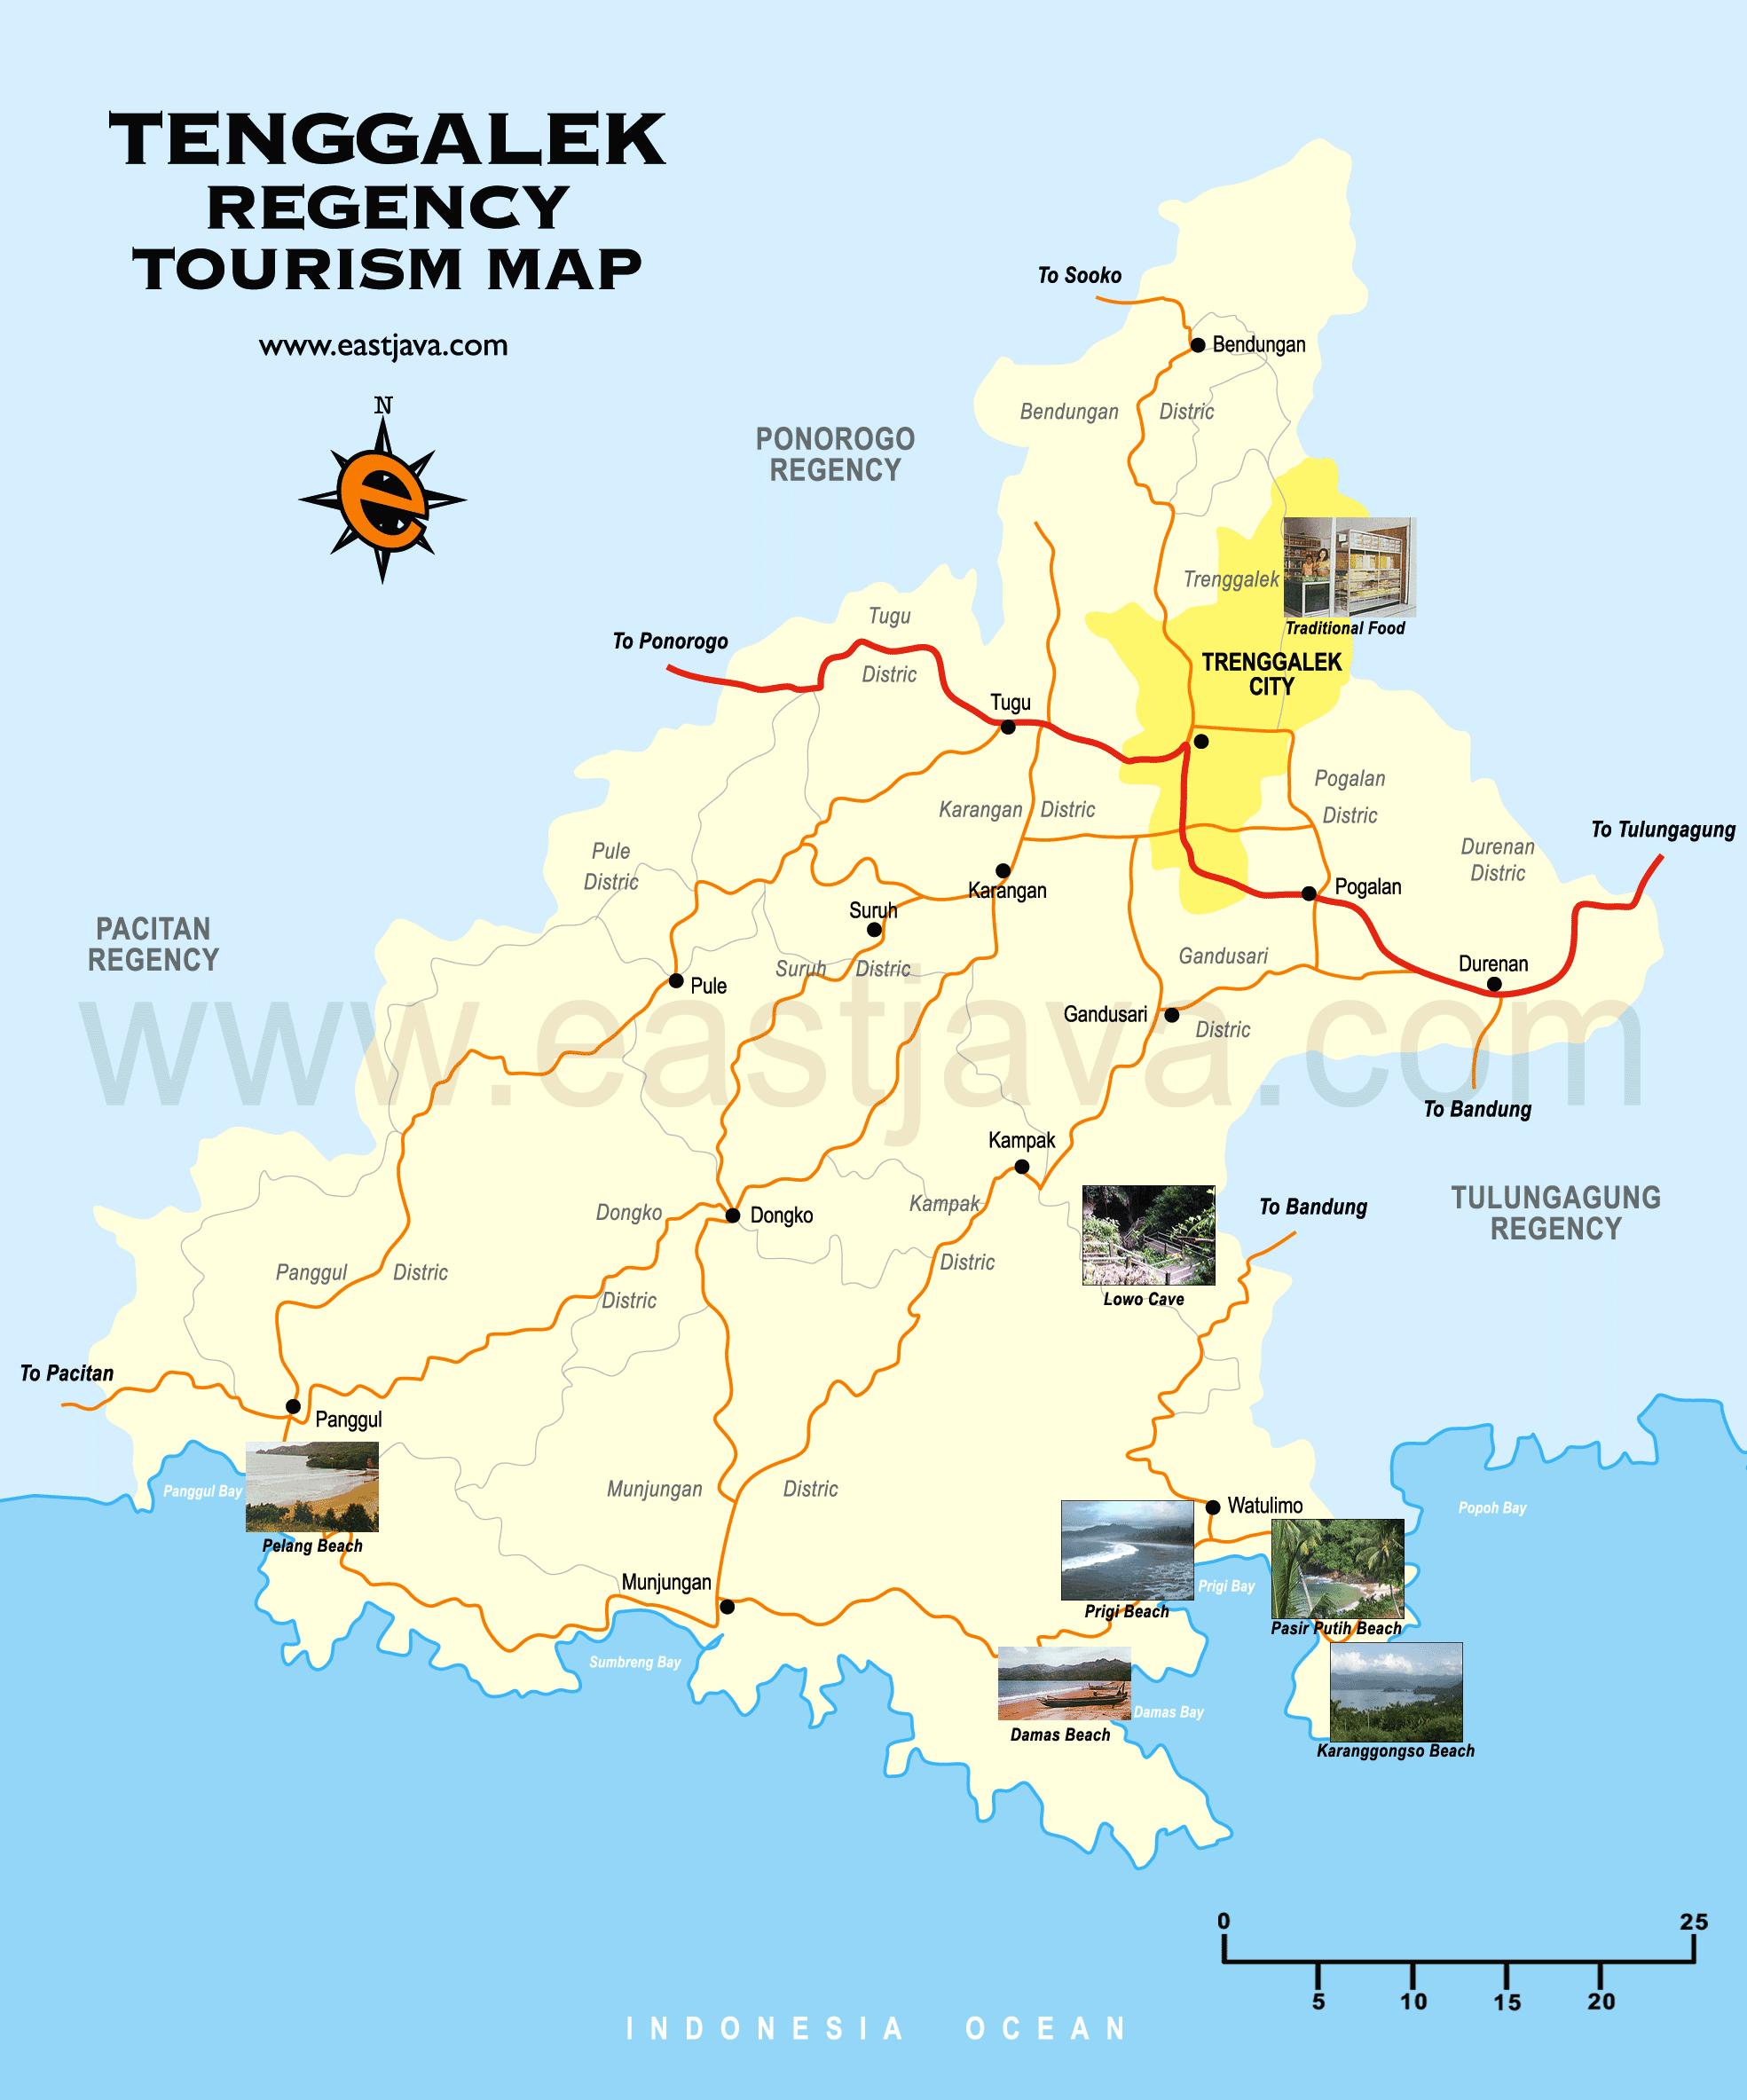 Trenggalek Map Peta Kabupaten Wisata Pantai Prigi Kab